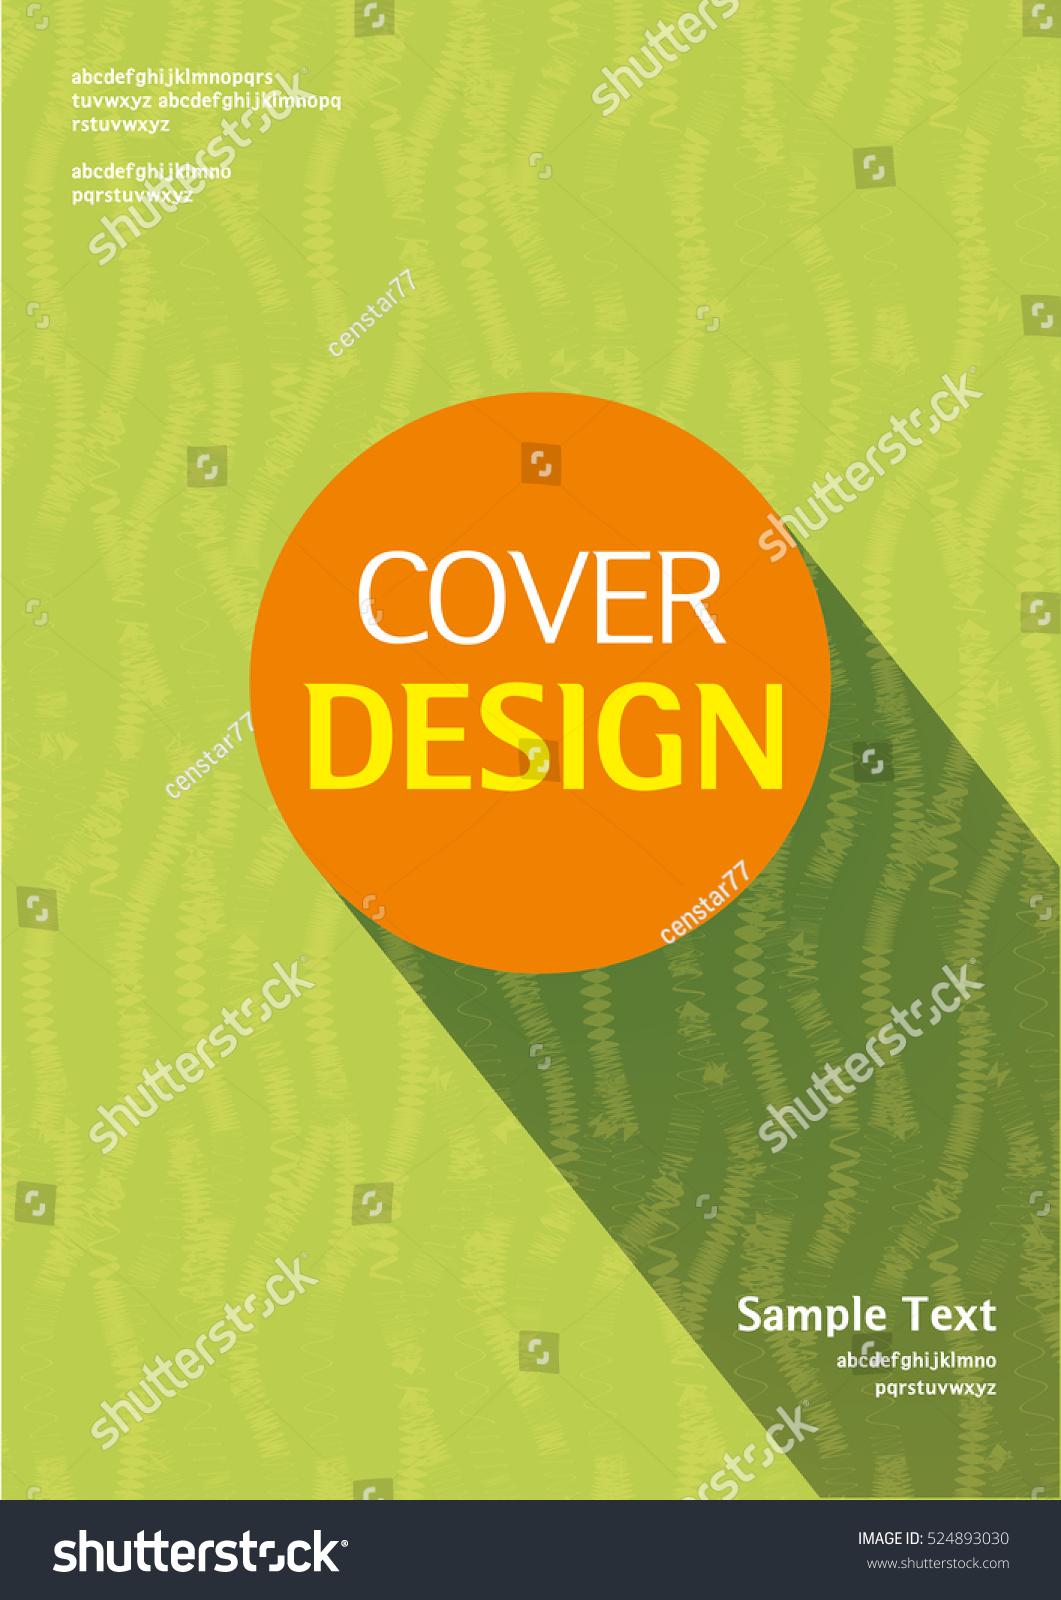 Best Book Cover Vector : Book cover design stock vector shutterstock